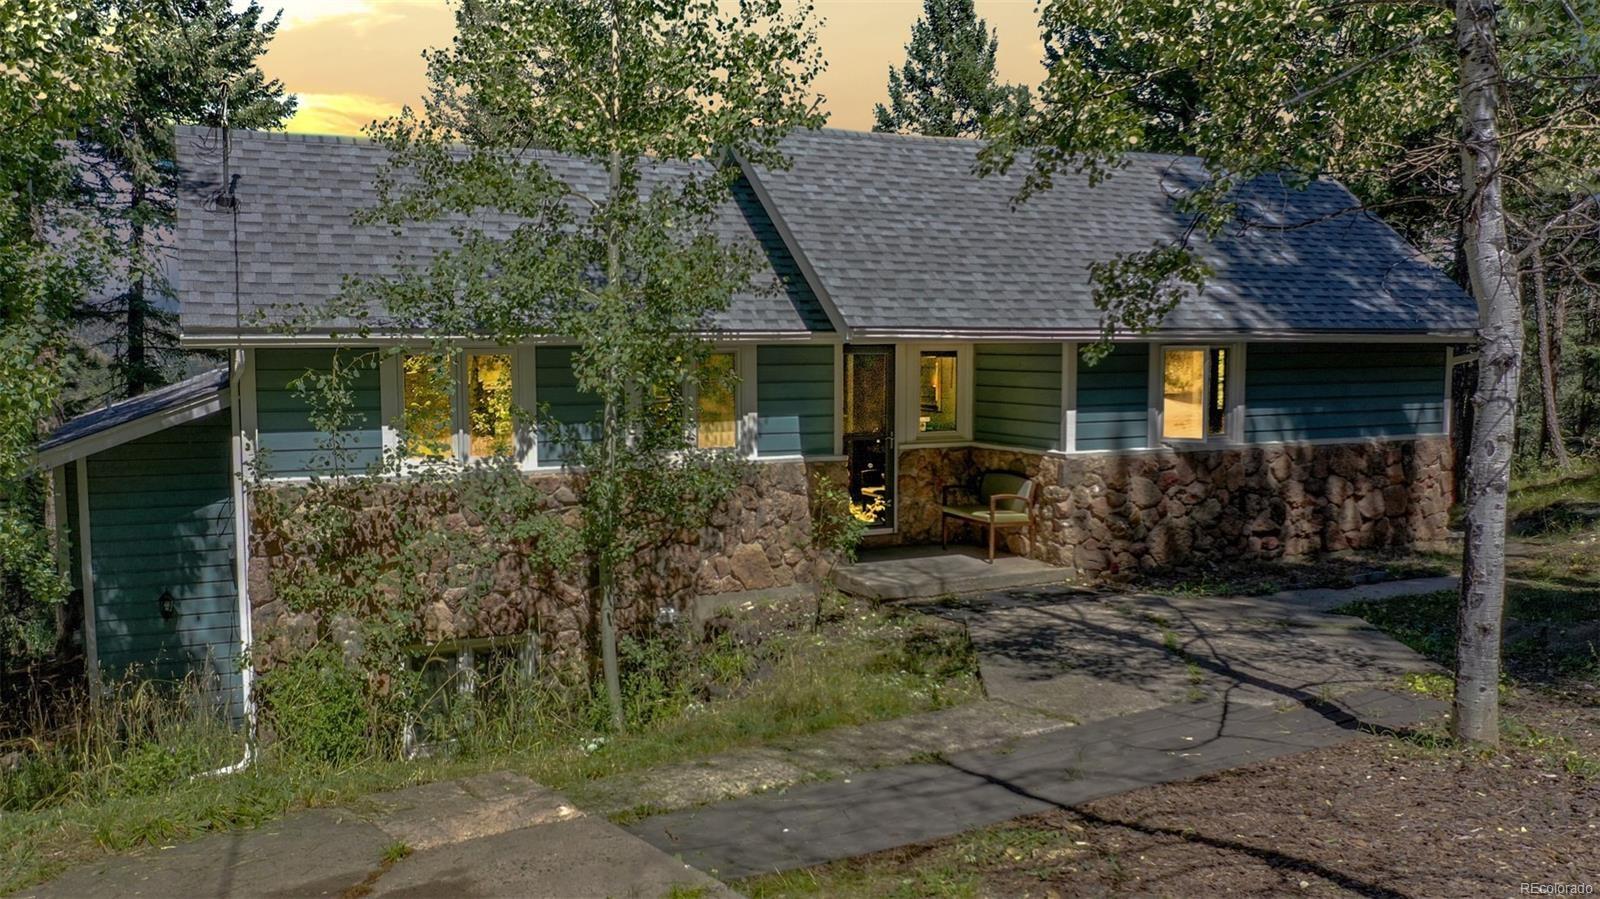 MLS# 5637548 - 1 - 6430 Ridgeview Drive, Morrison, CO 80465